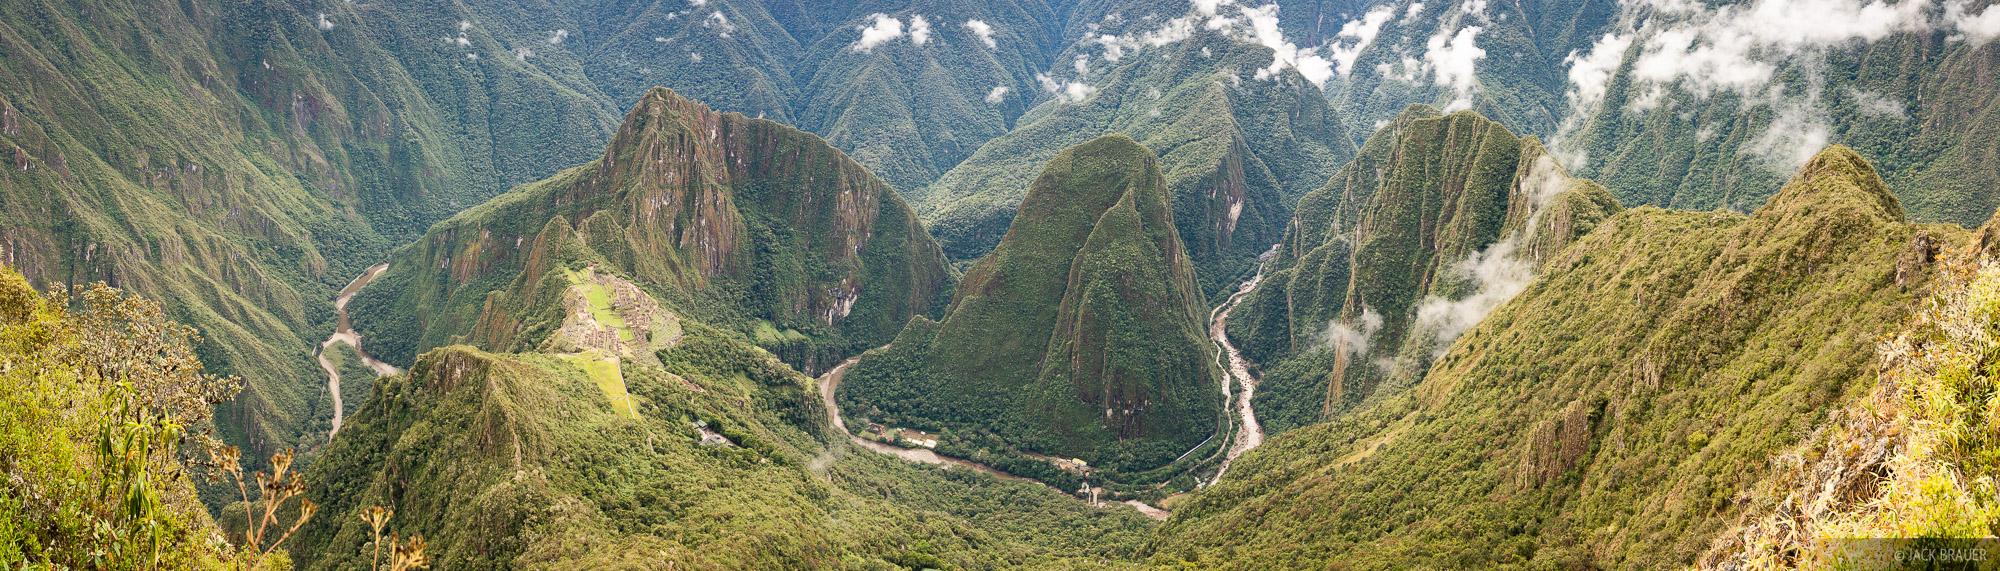 Cordillera Vilcabamba, Macchu Picchu, Peru, Rio Urubamba, South America, photo